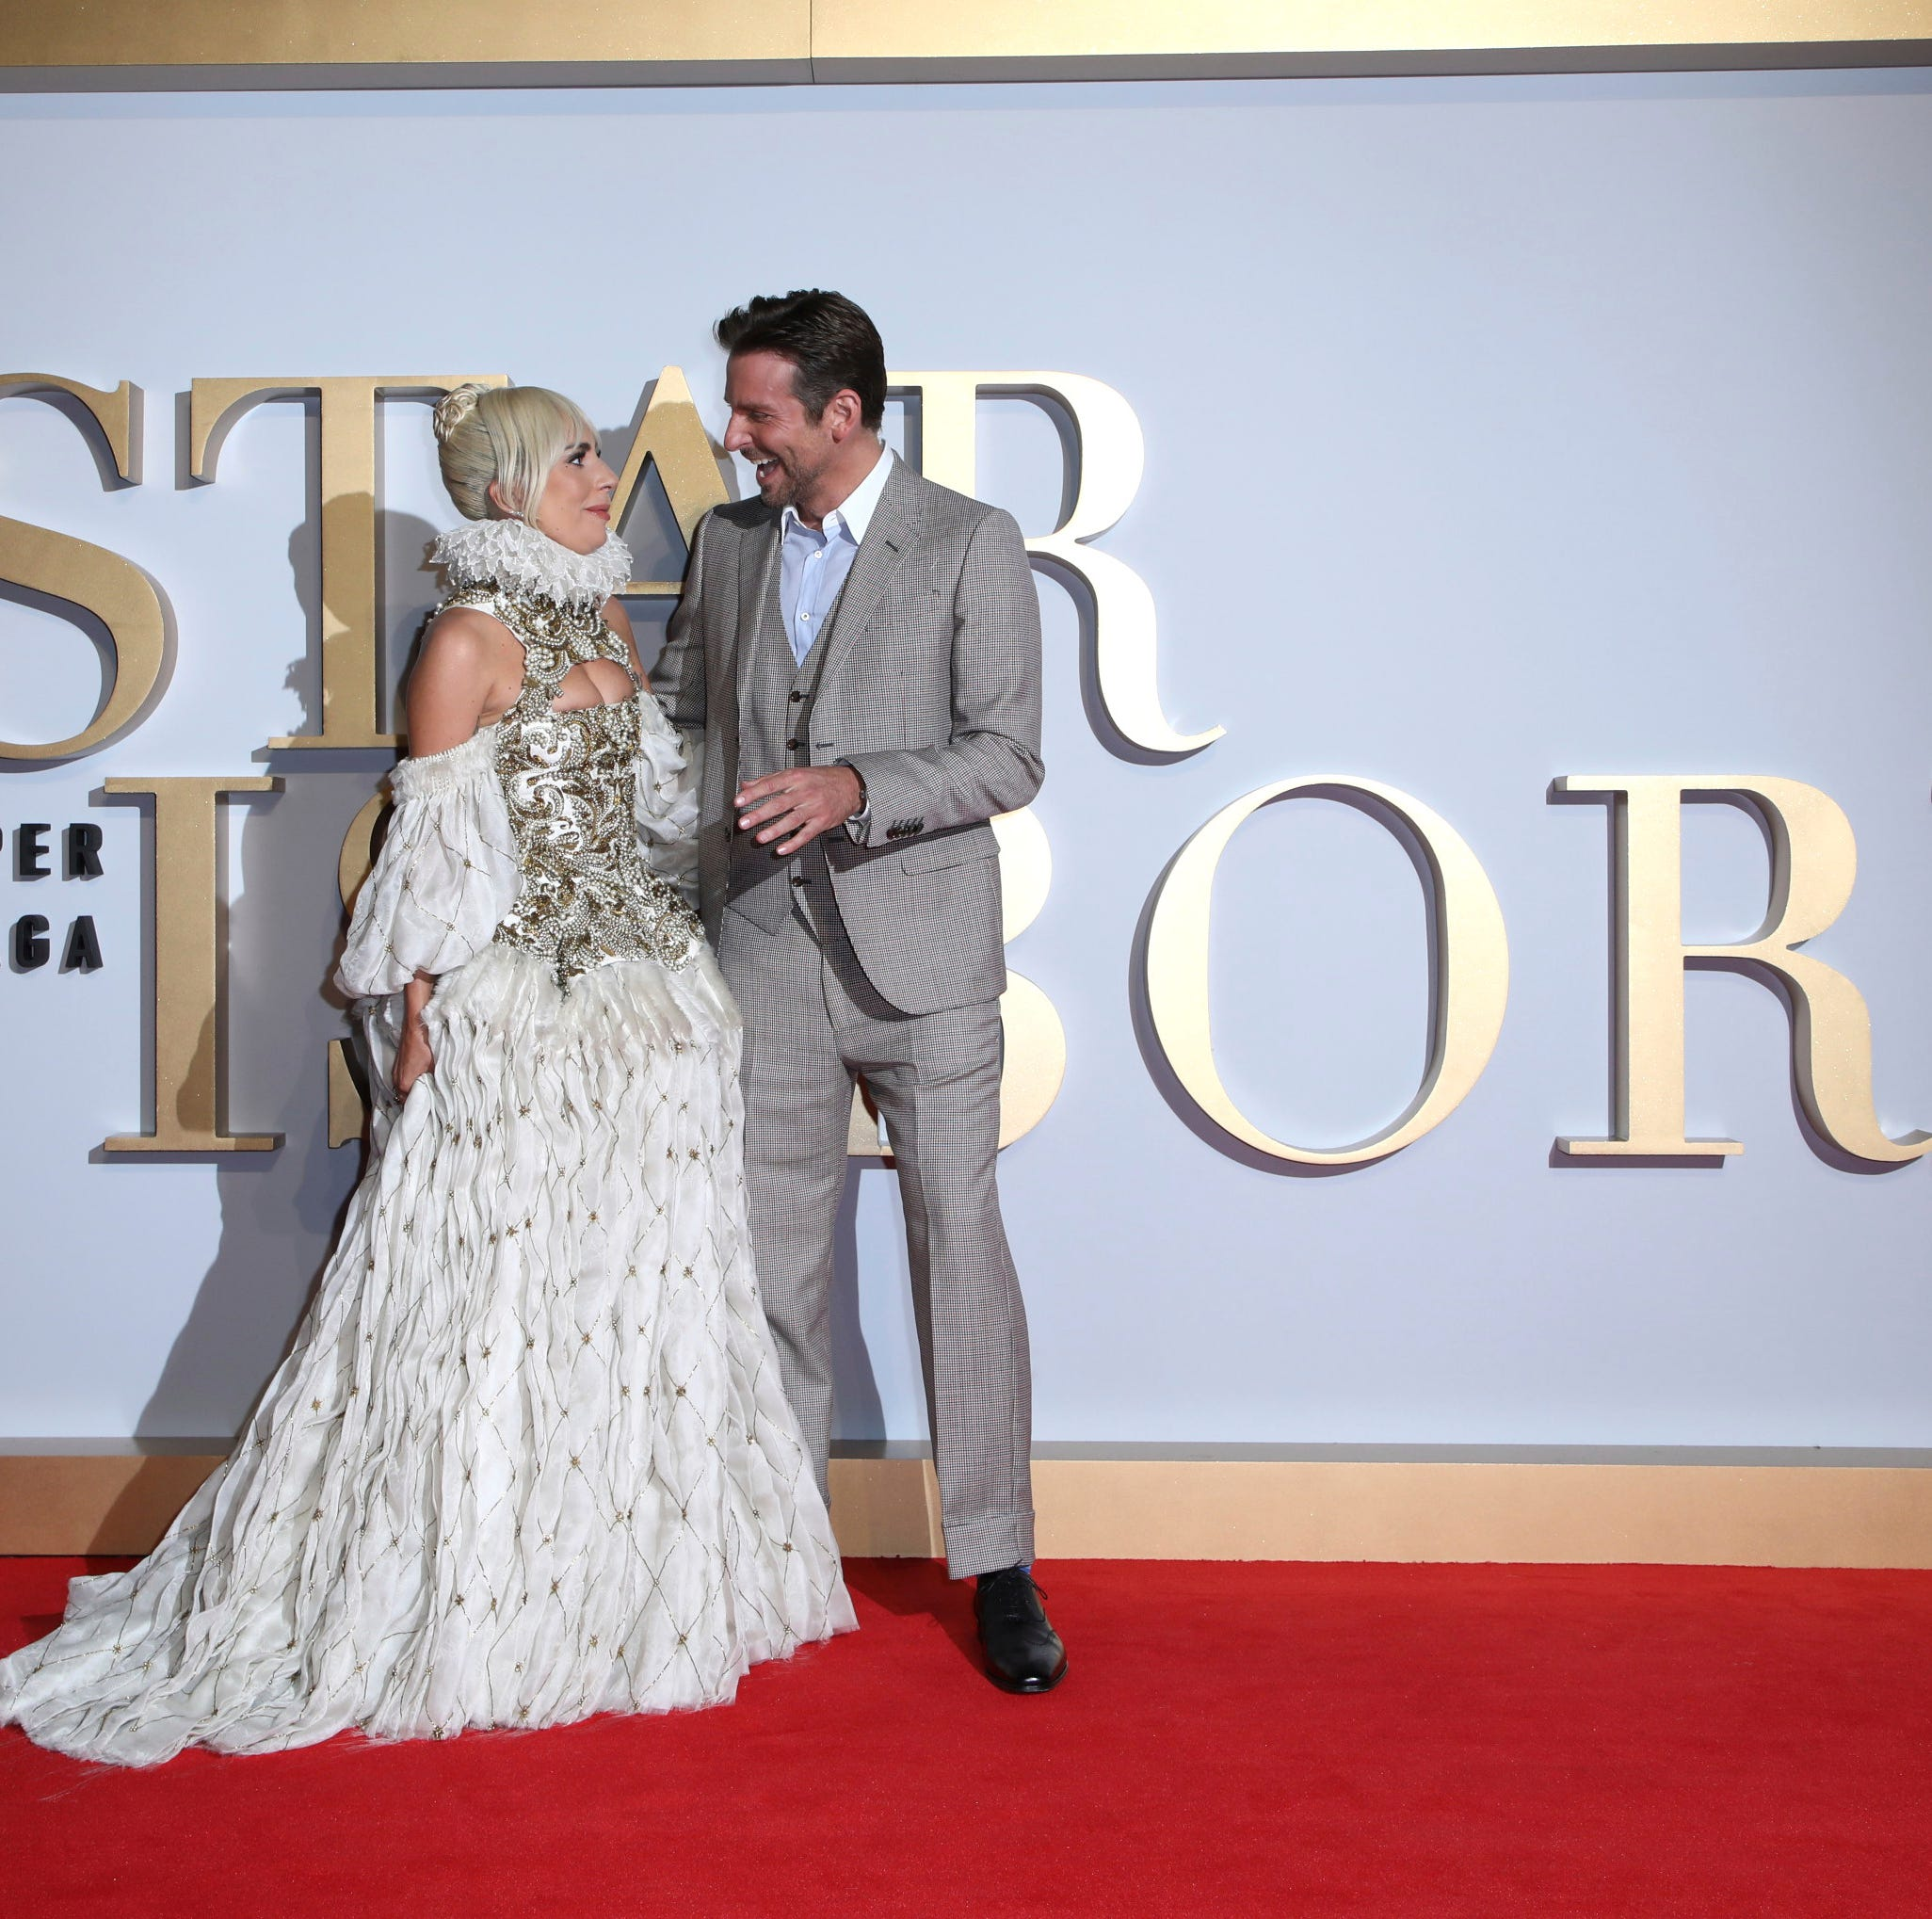 'A Star Is Born' tops SAG Awards nominations; Cooper, Lady Gaga, Elliott nominated